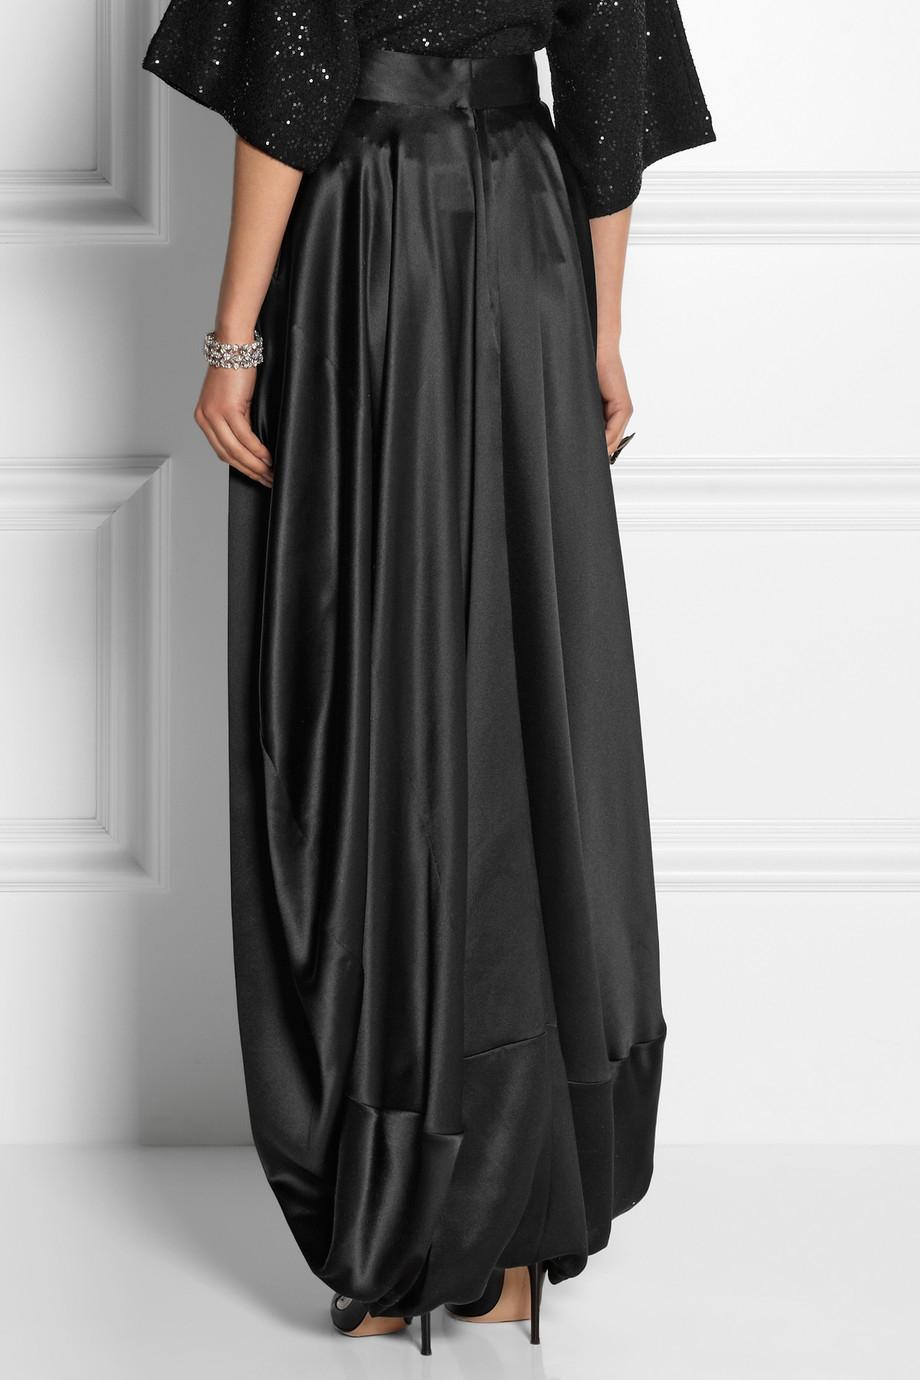 2019 hot sale new appearance fine quality Oscar de la Renta Silk-Satin Maxi Skirt in Black - Lyst